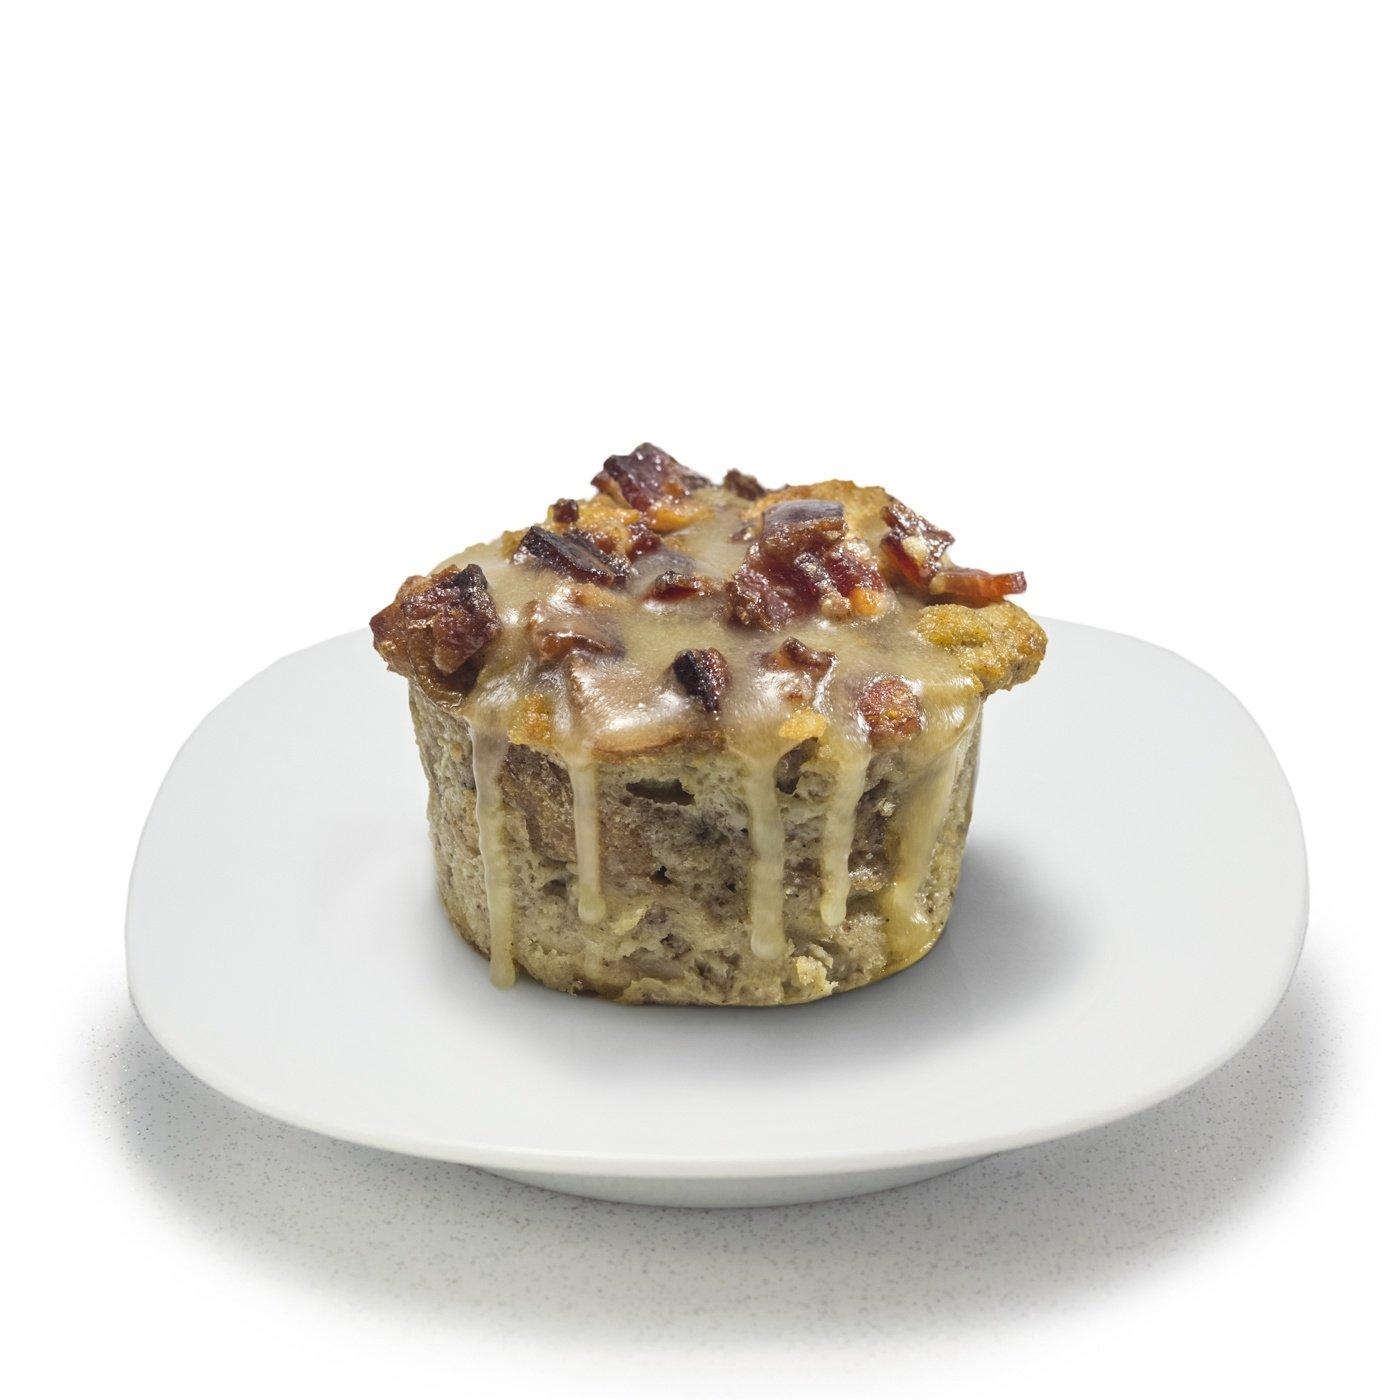 Maple bacon - applewood smoked bacon & salted maple glaze.